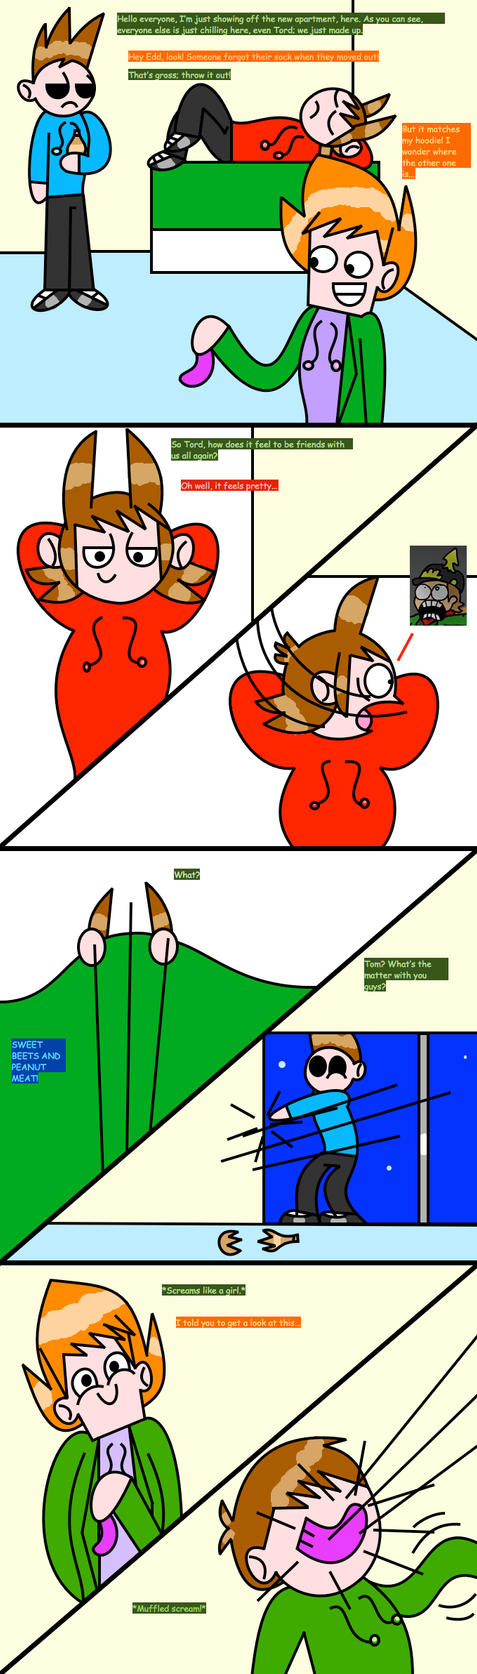 Eddsworld: Overreact Much? by creepypastajack